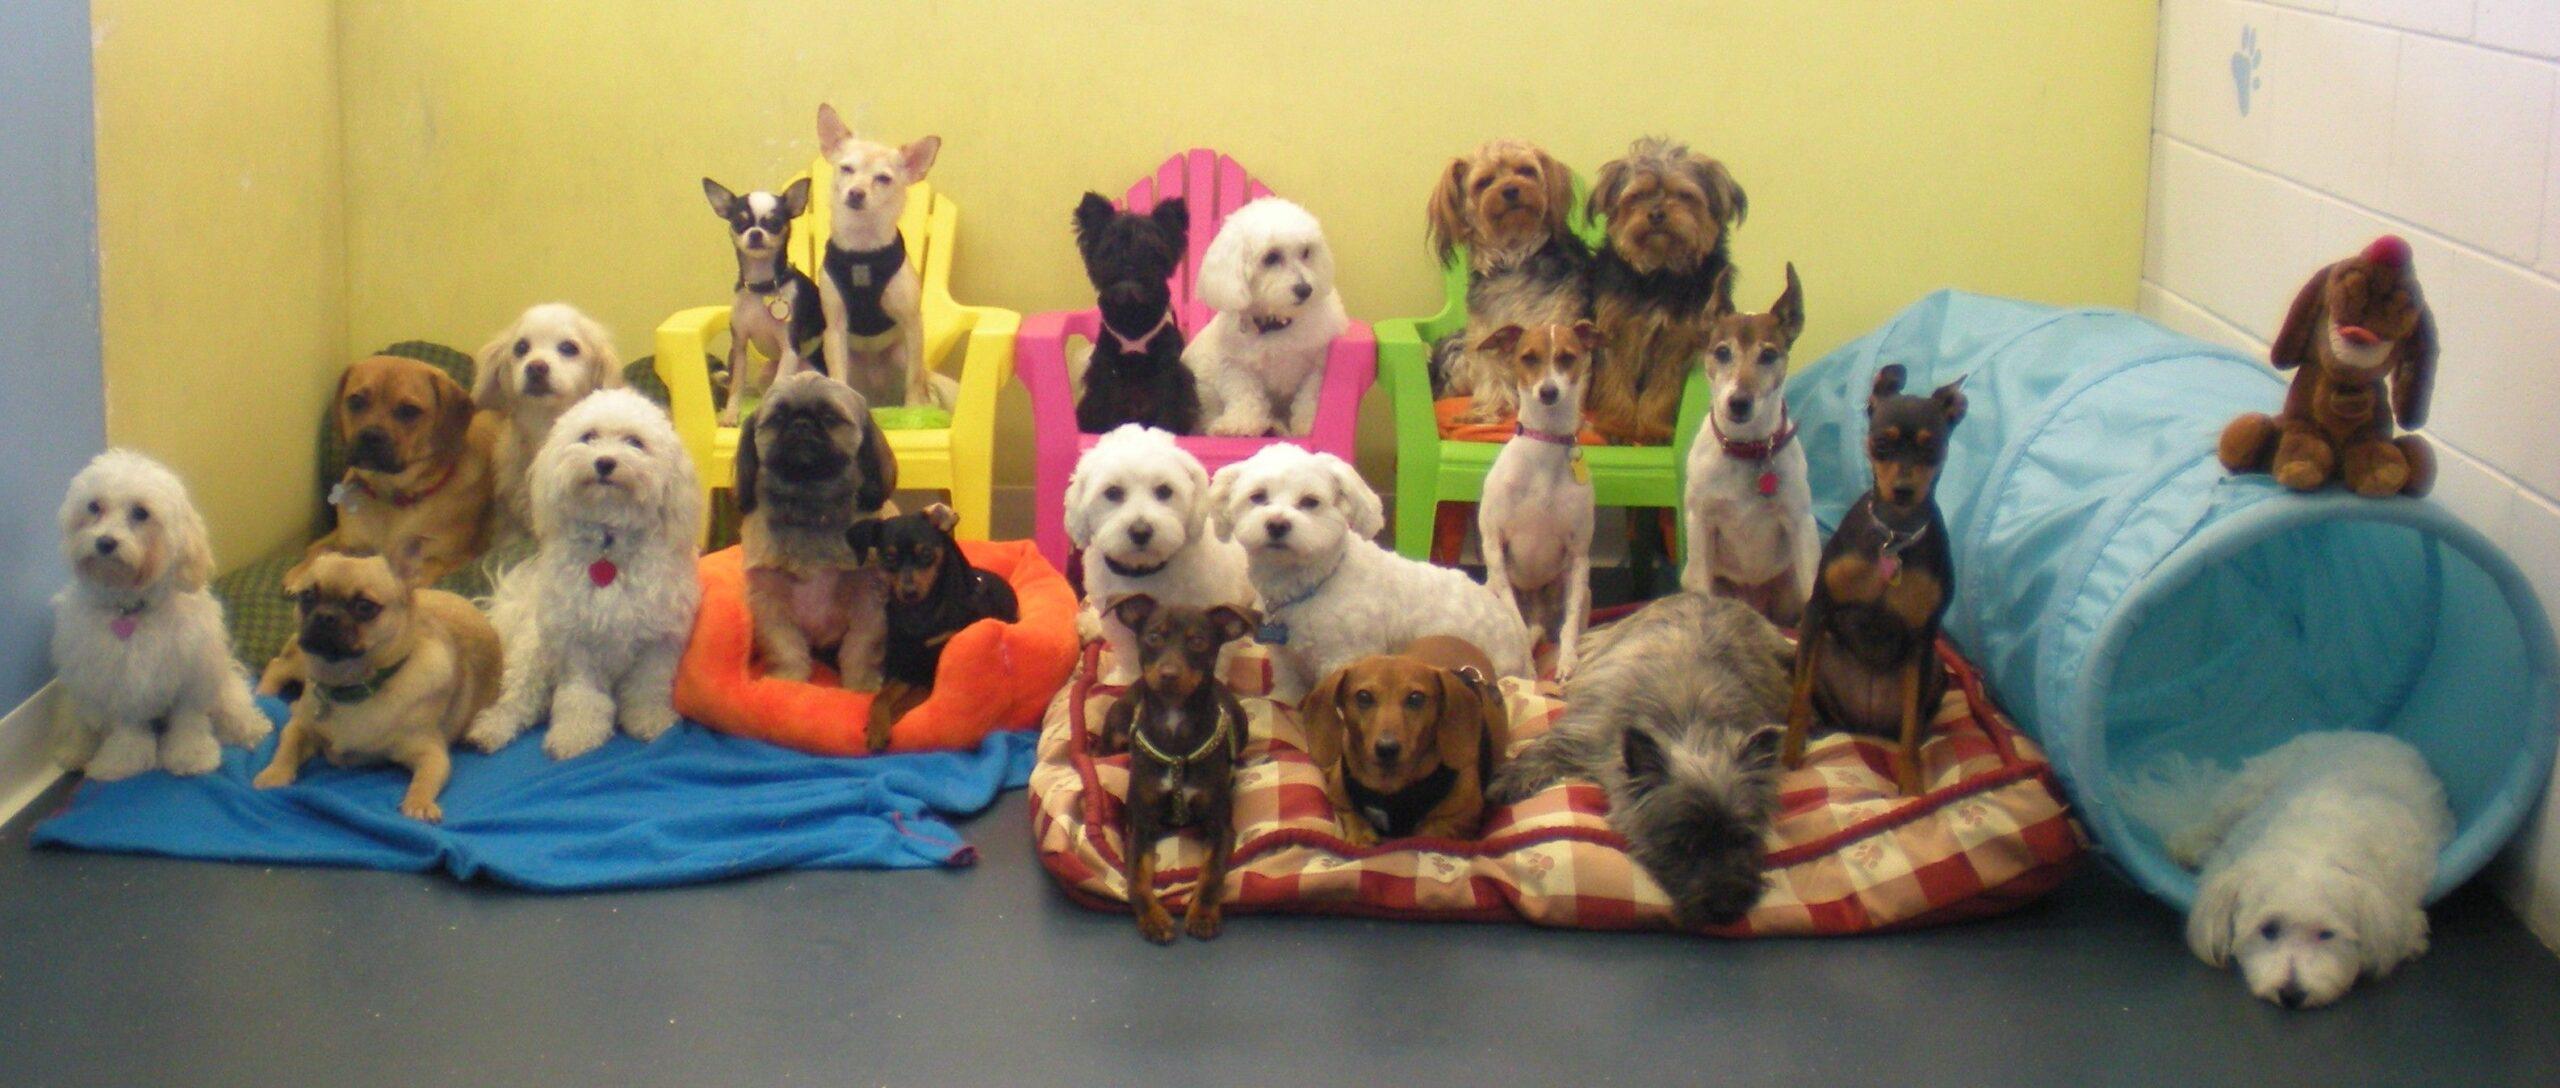 asili-per-cani